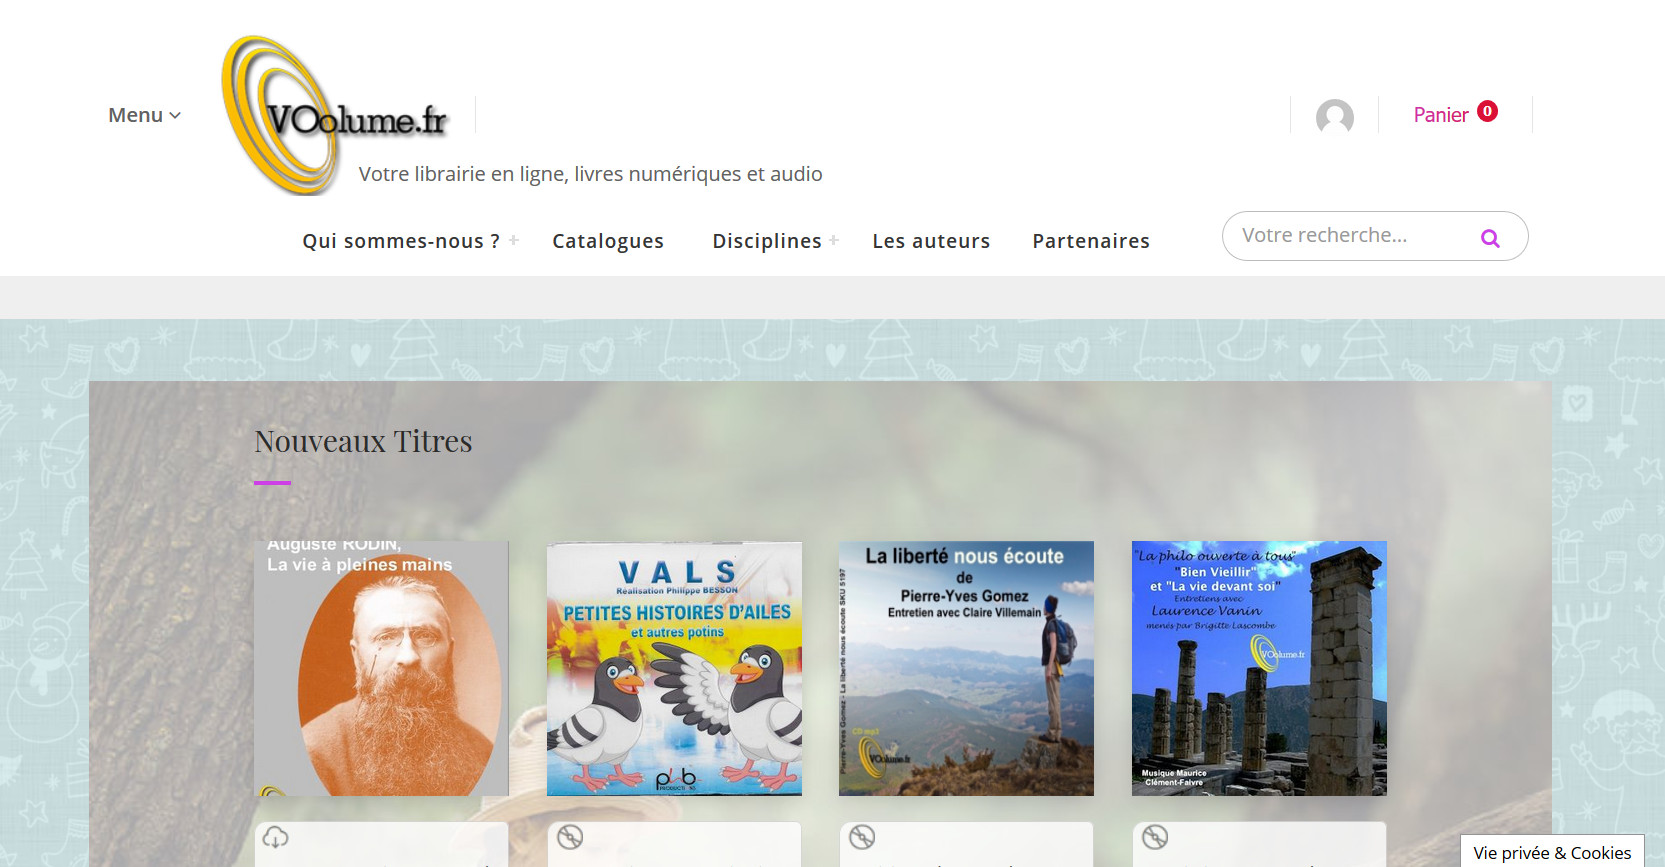 VOolume.fr livres audio